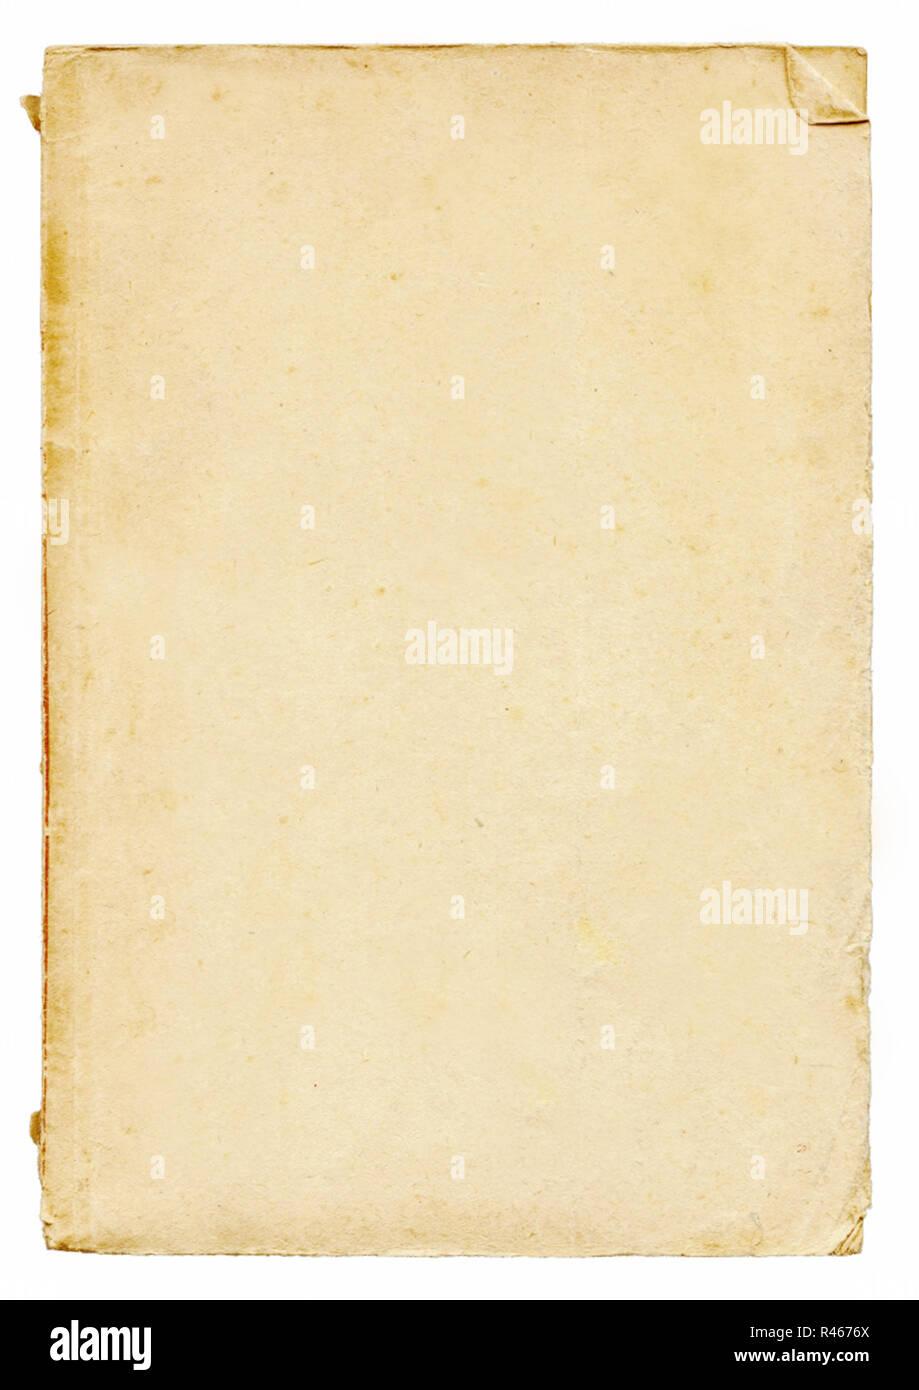 vertical blank old vintage paper - Stock Image